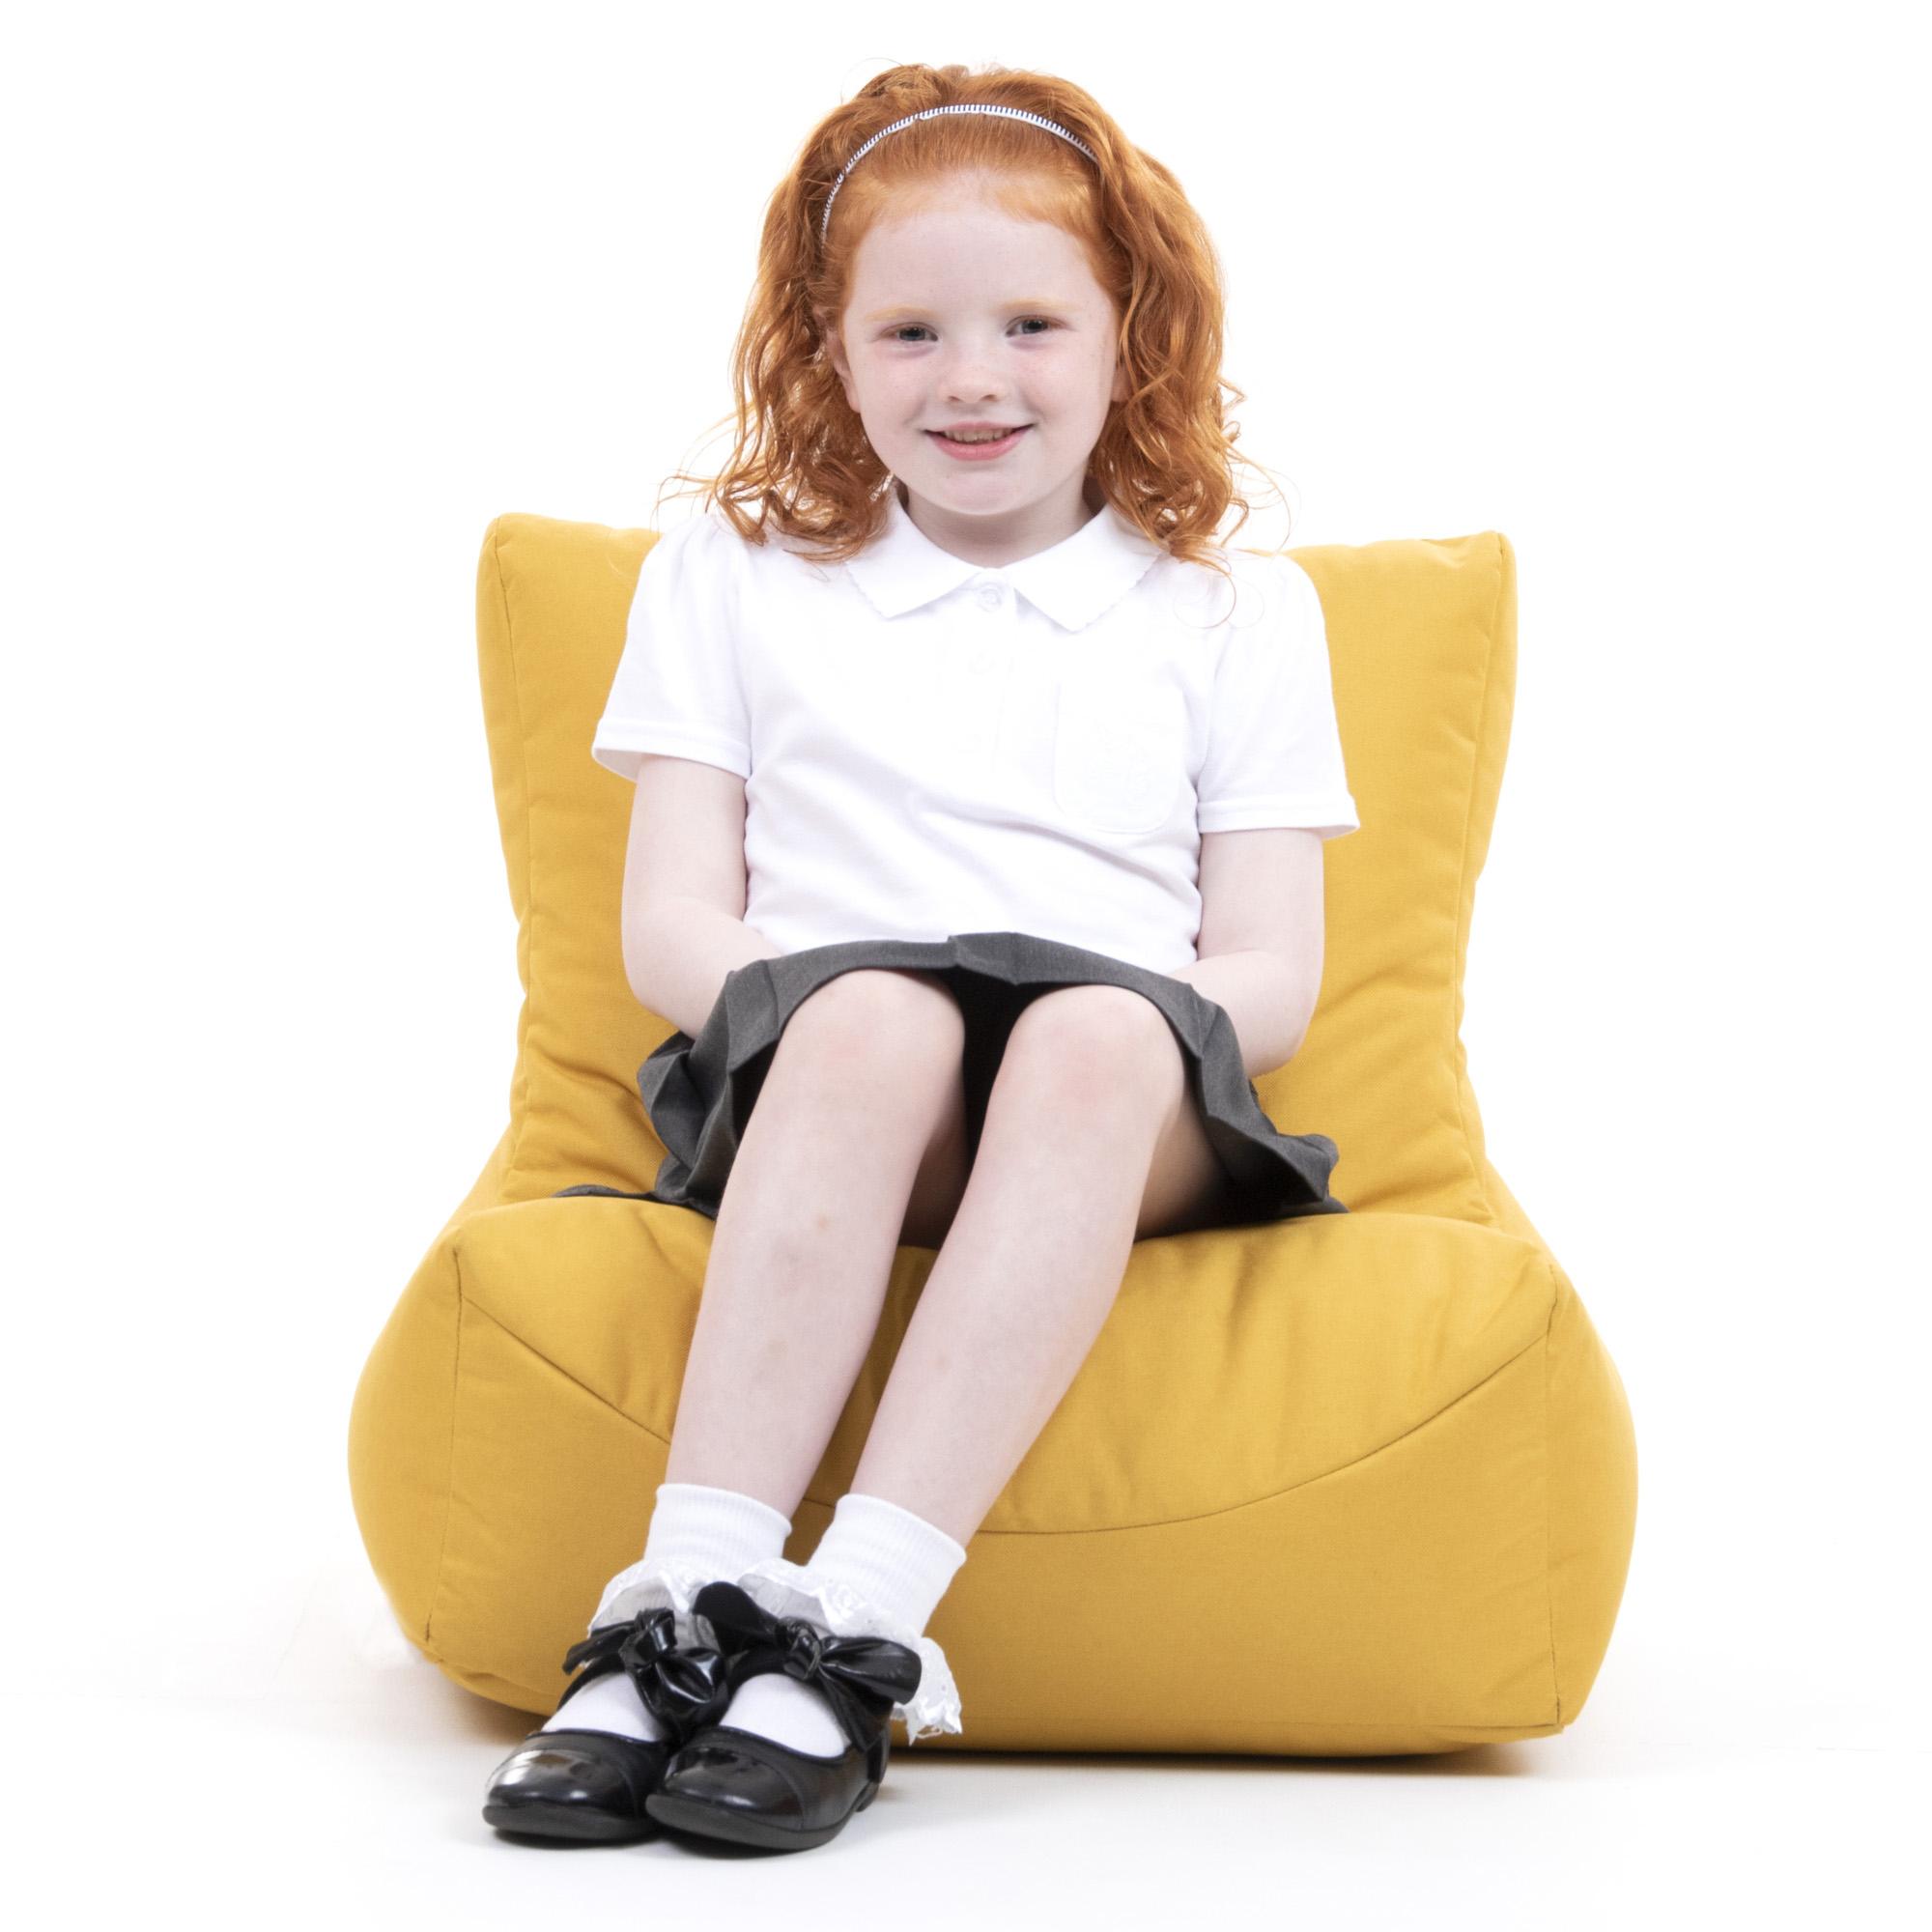 Eden-PRI-Smile-Chair-Mustard-4-300dpi